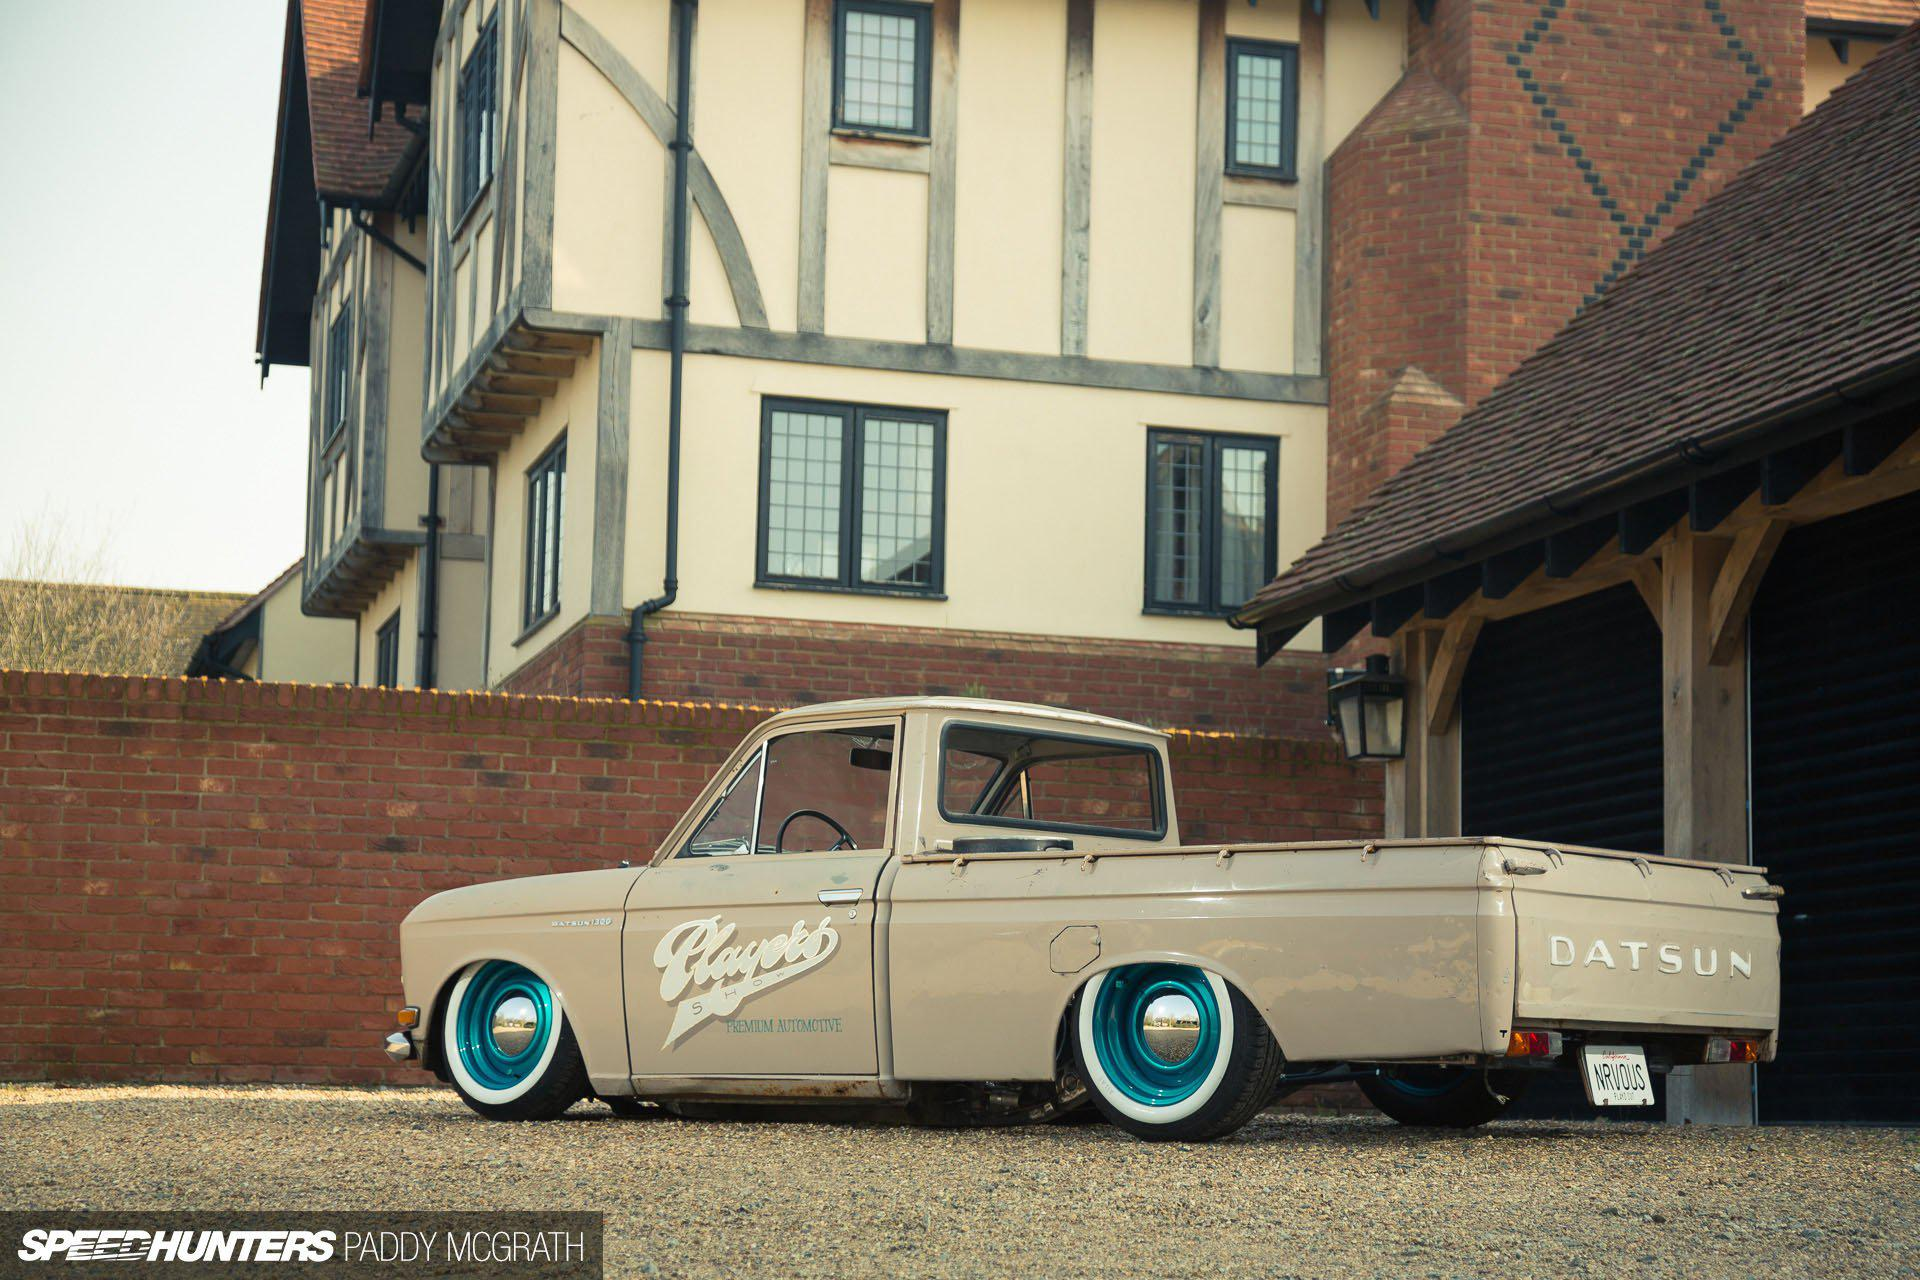 Hd Datsun 520 Pickup Lowrider Classic Tuning Hd Free 1920x1280 Wallpaper Teahub Io